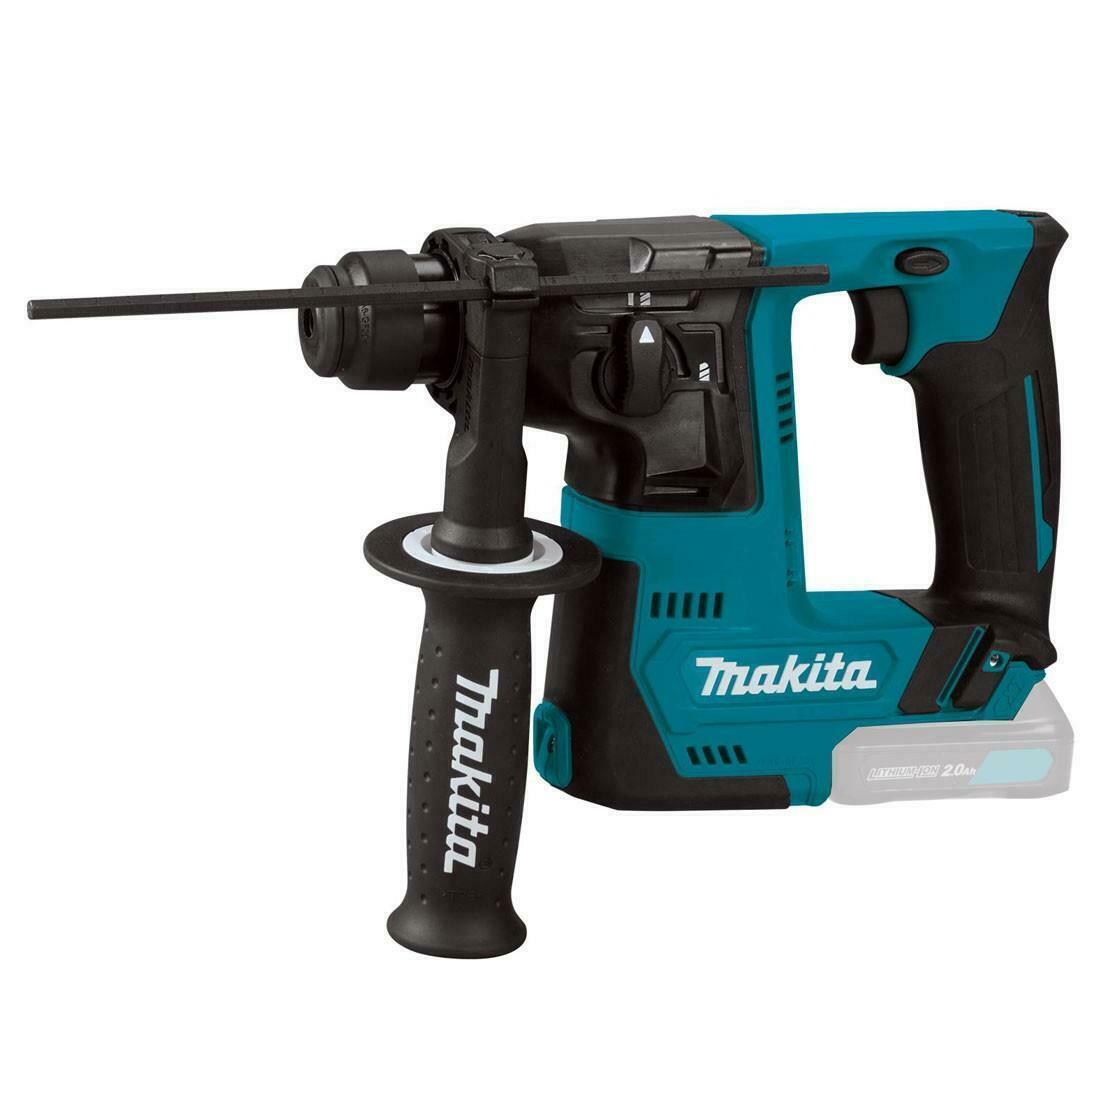 Makita HR140DZ 12v 14mm CXT SDS Rotary Hammer Drill - Body Only- £49.95 @ ahcpowertools / eBay